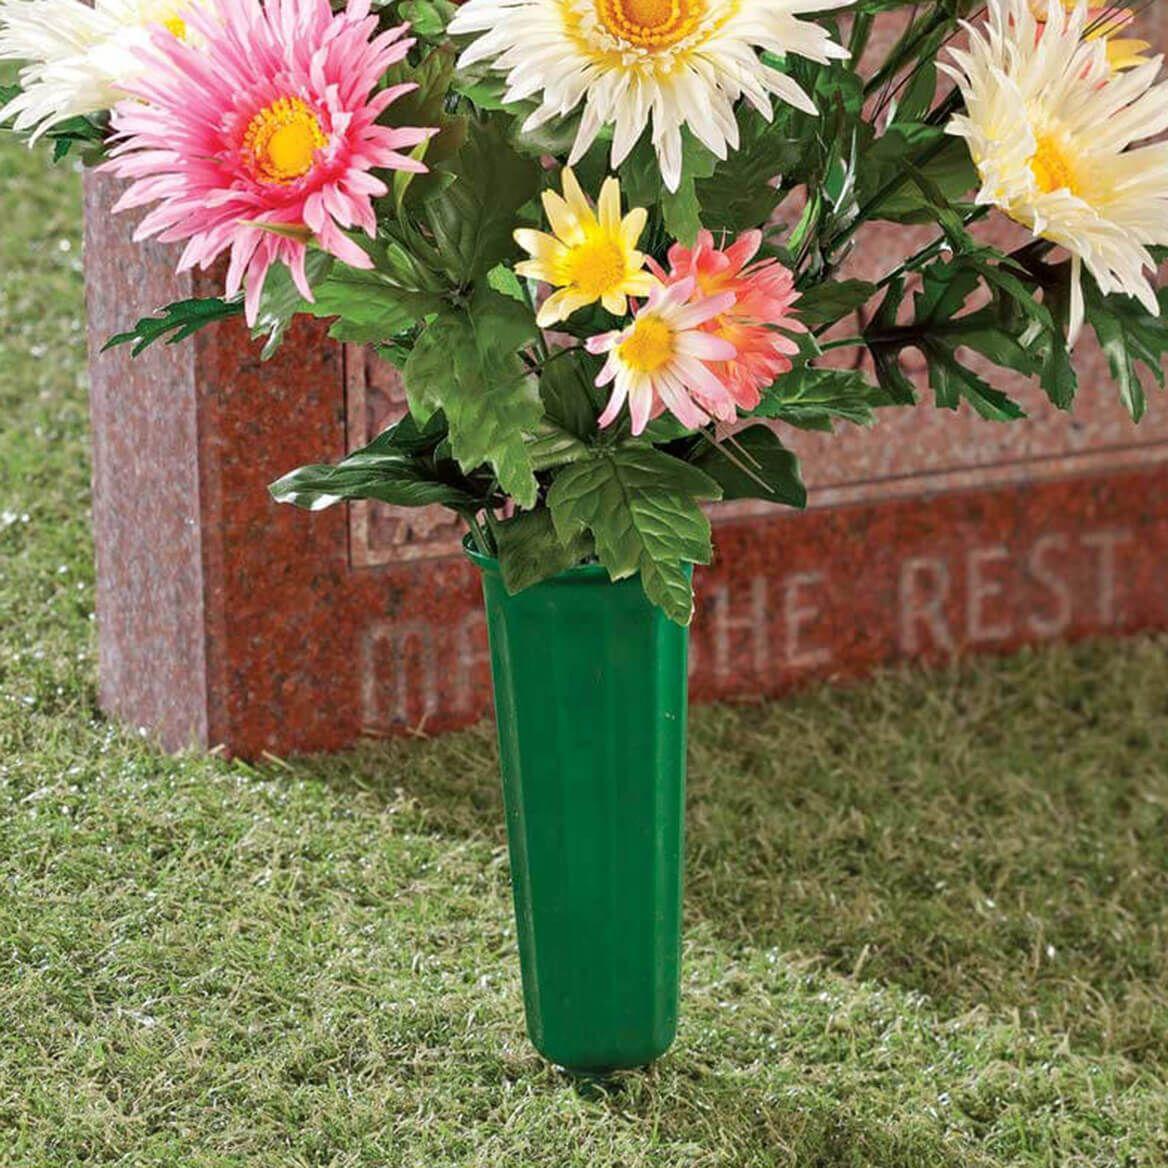 Memorial Cemetery Vases, Set of 2-347071